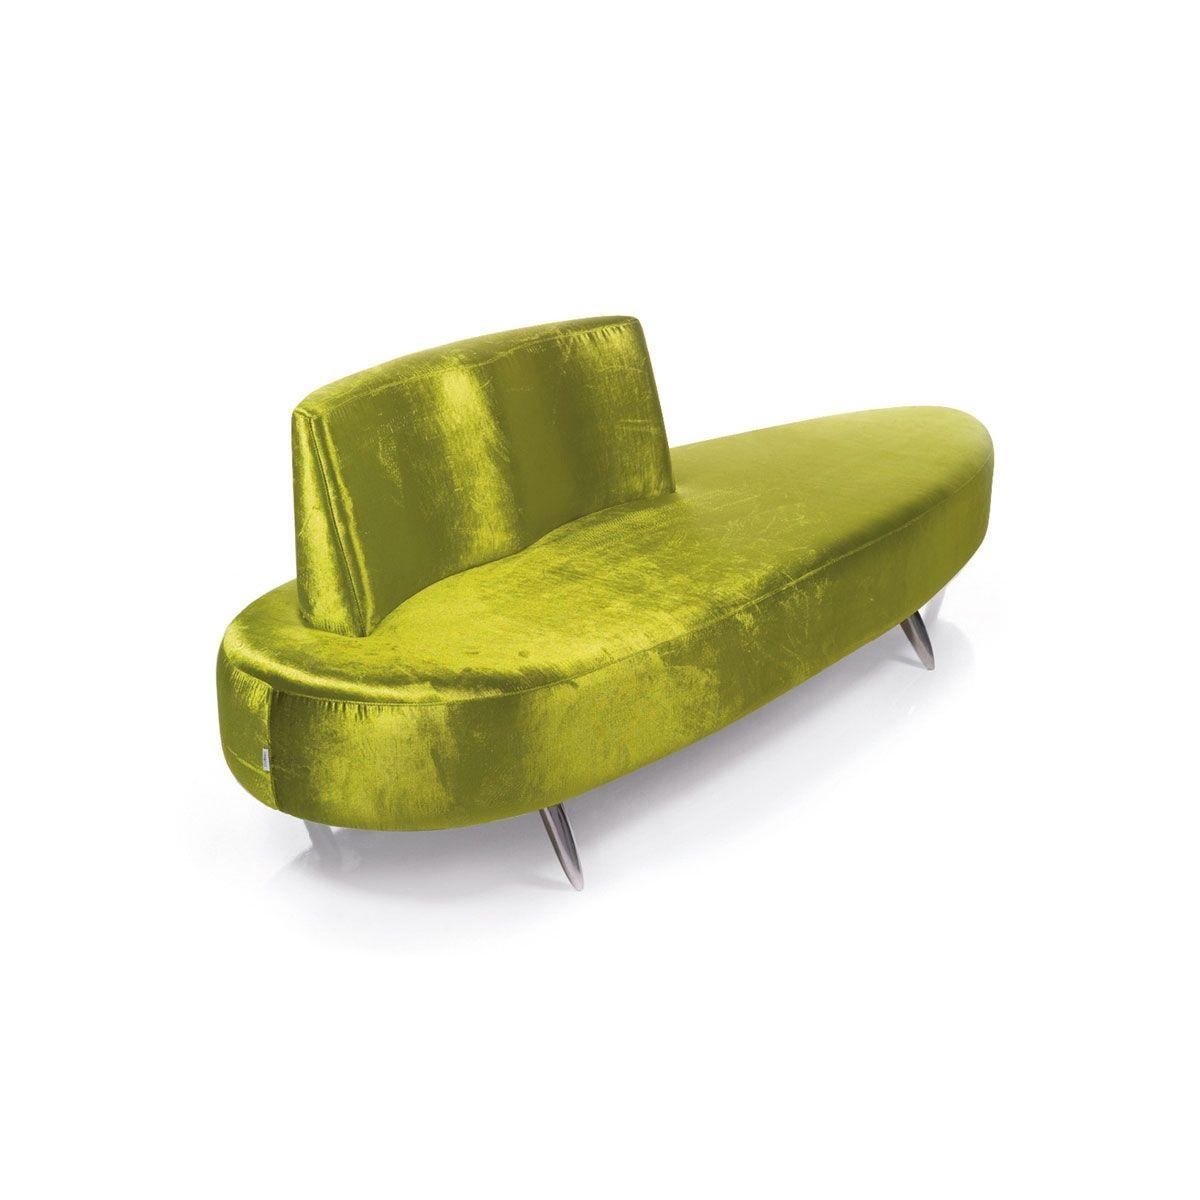 beauty salon waiting area chairs shower for handicap islamorada 190 seating equipment